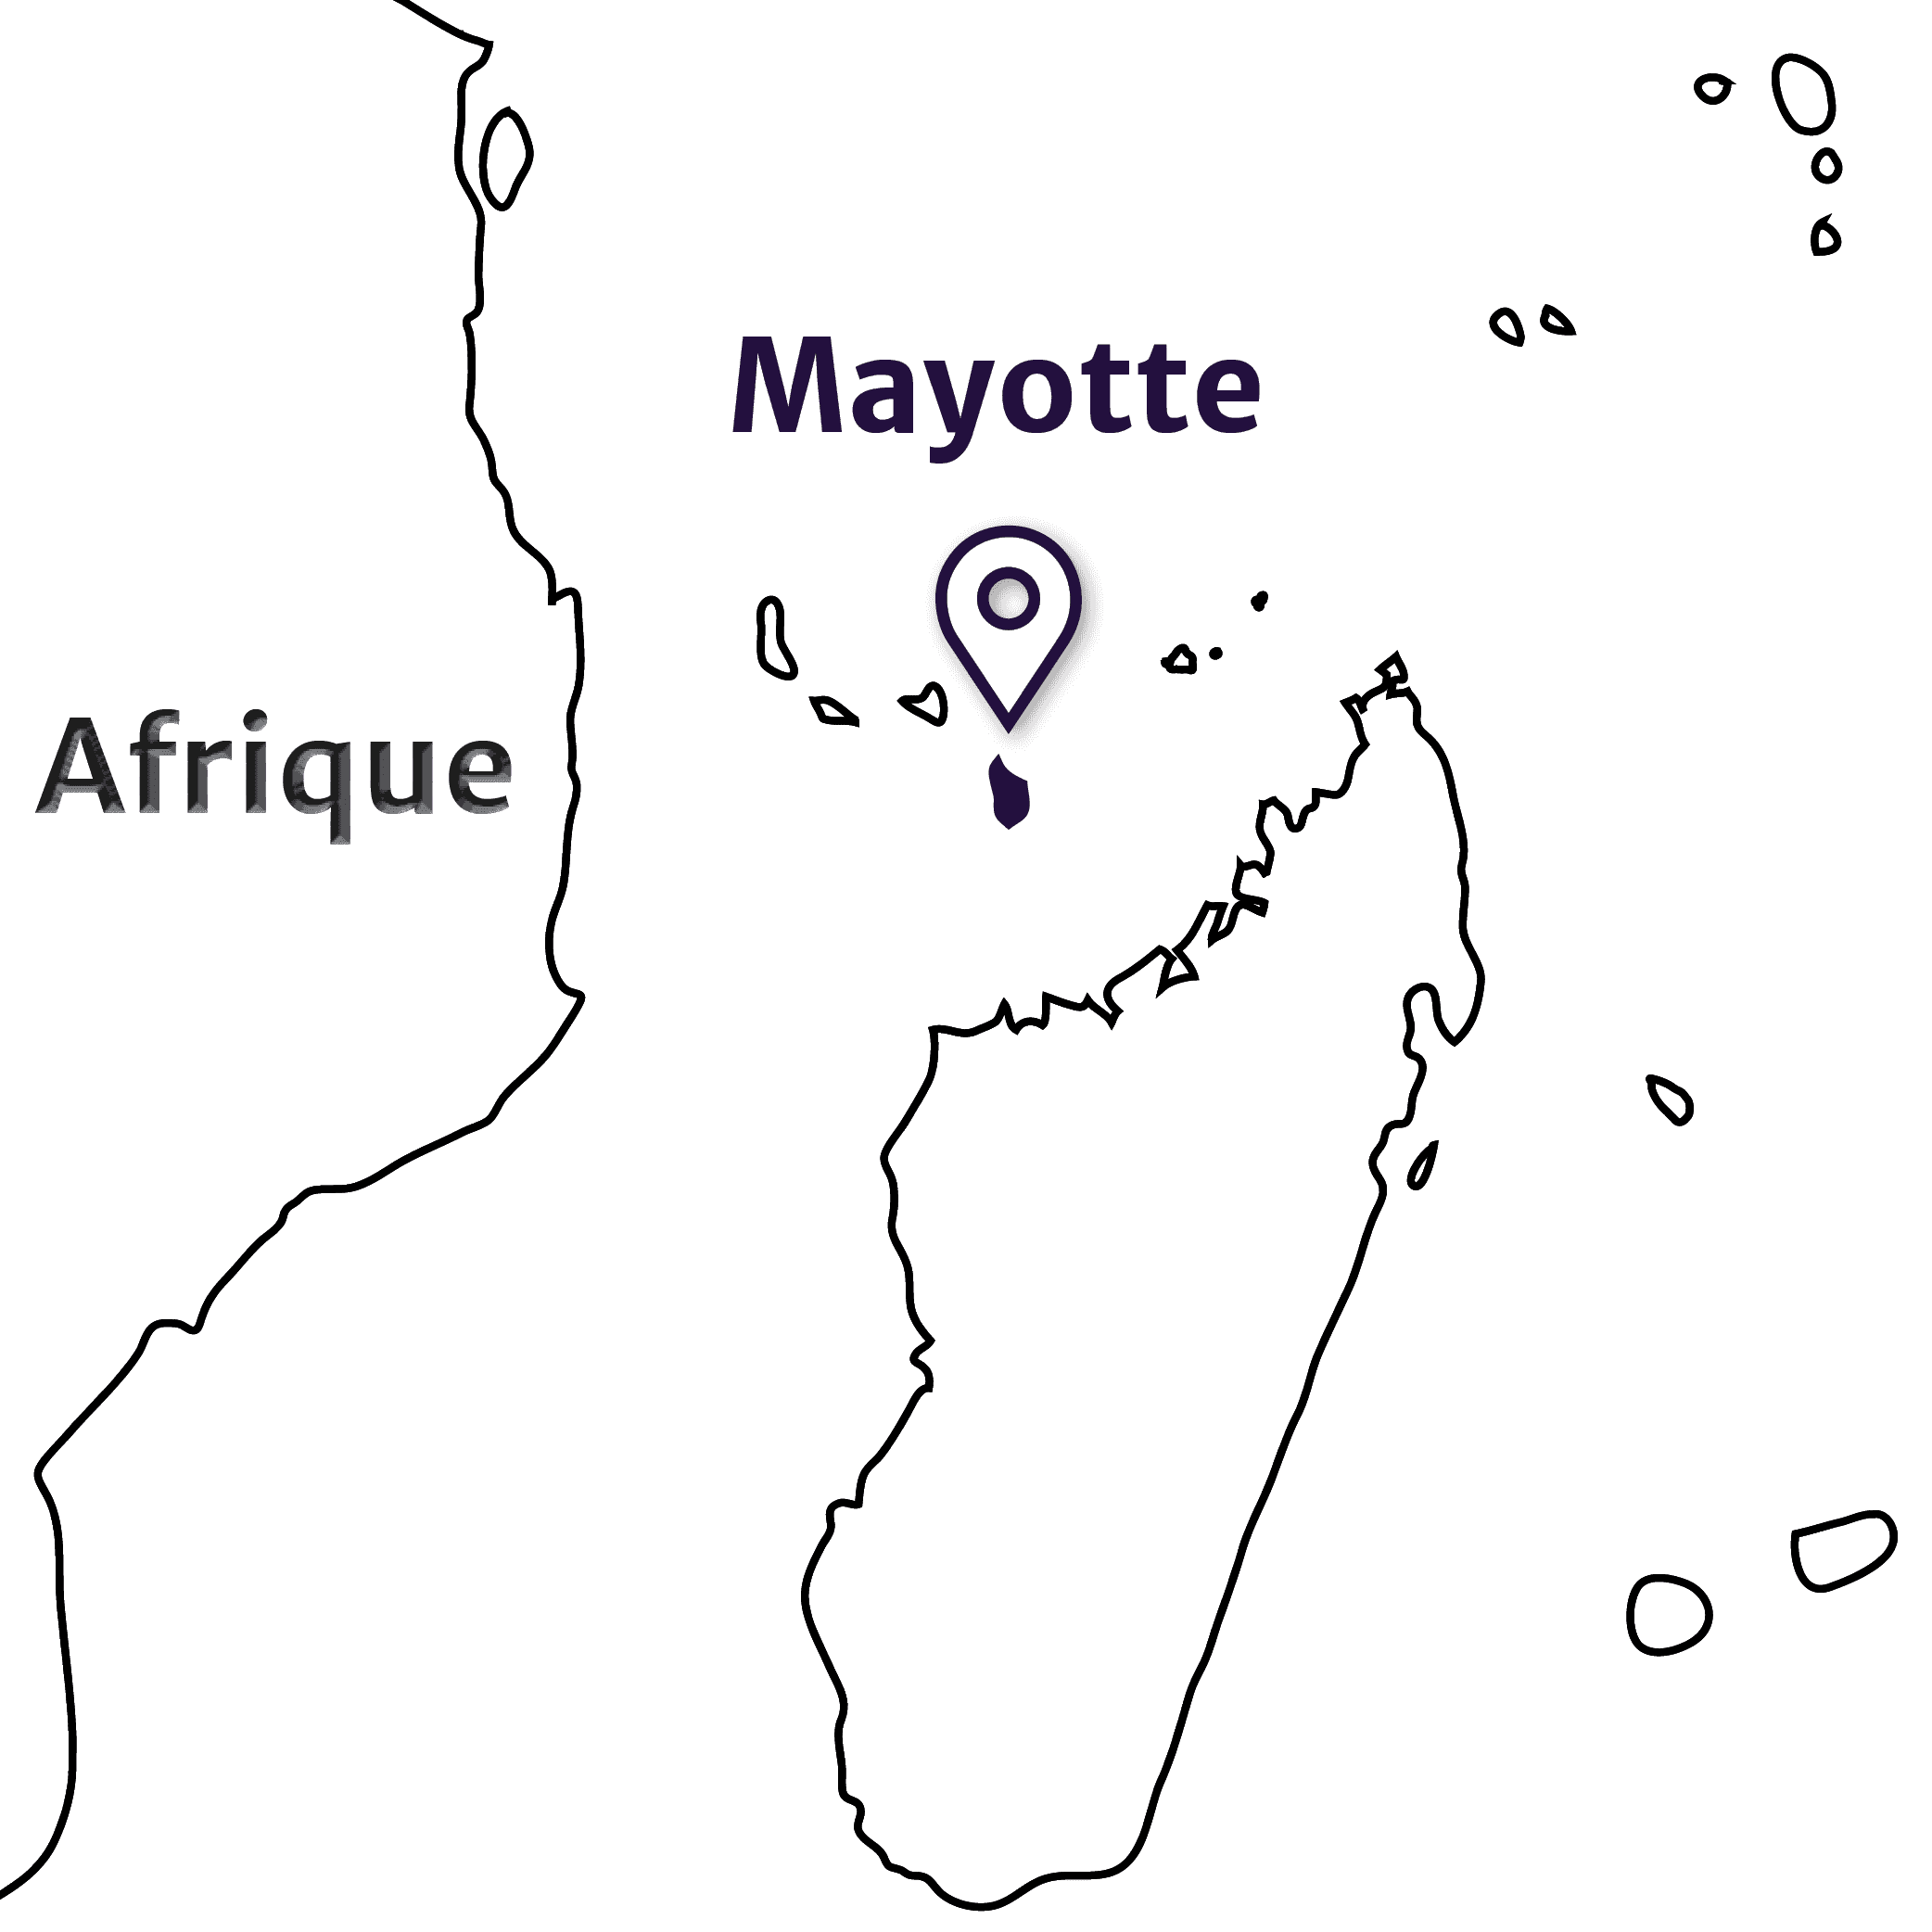 AFRIQUE-MAYOTTE